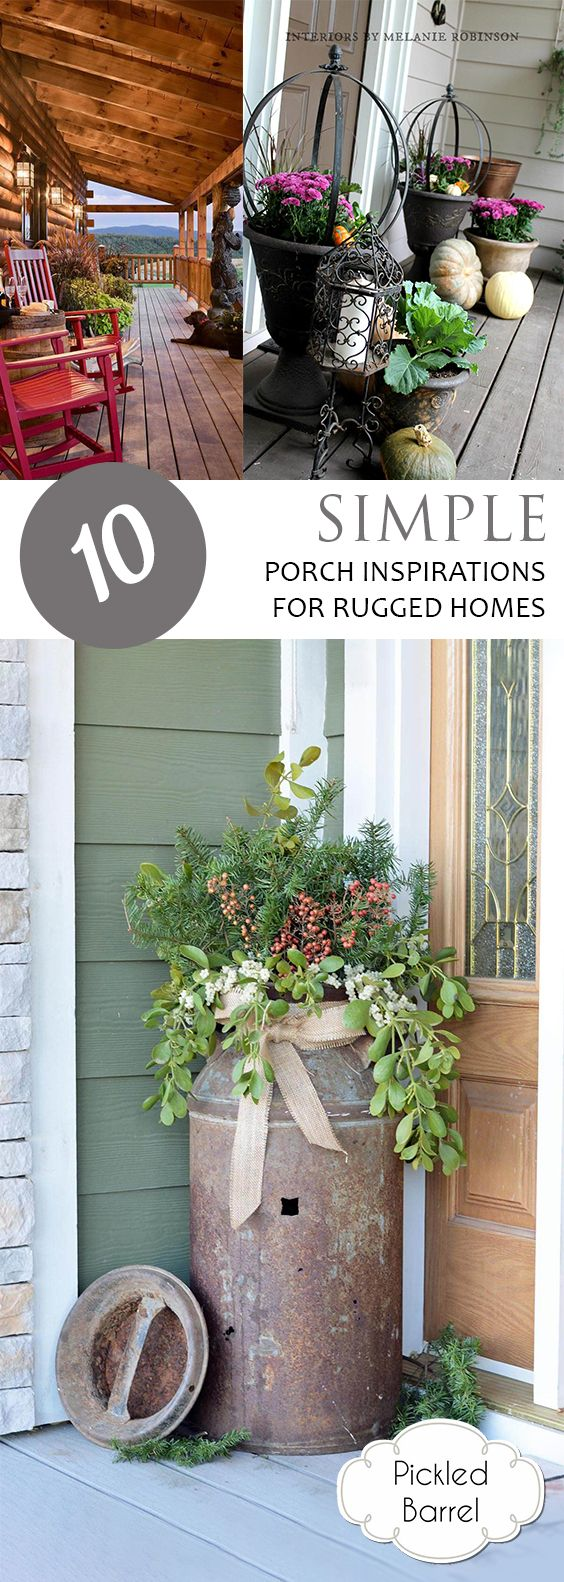 Inspiration for a large modern back porch remodel in san francisco -  Large Modern Back Porch Remodel In San Francisco 10 Simple Porch Inspirations Download